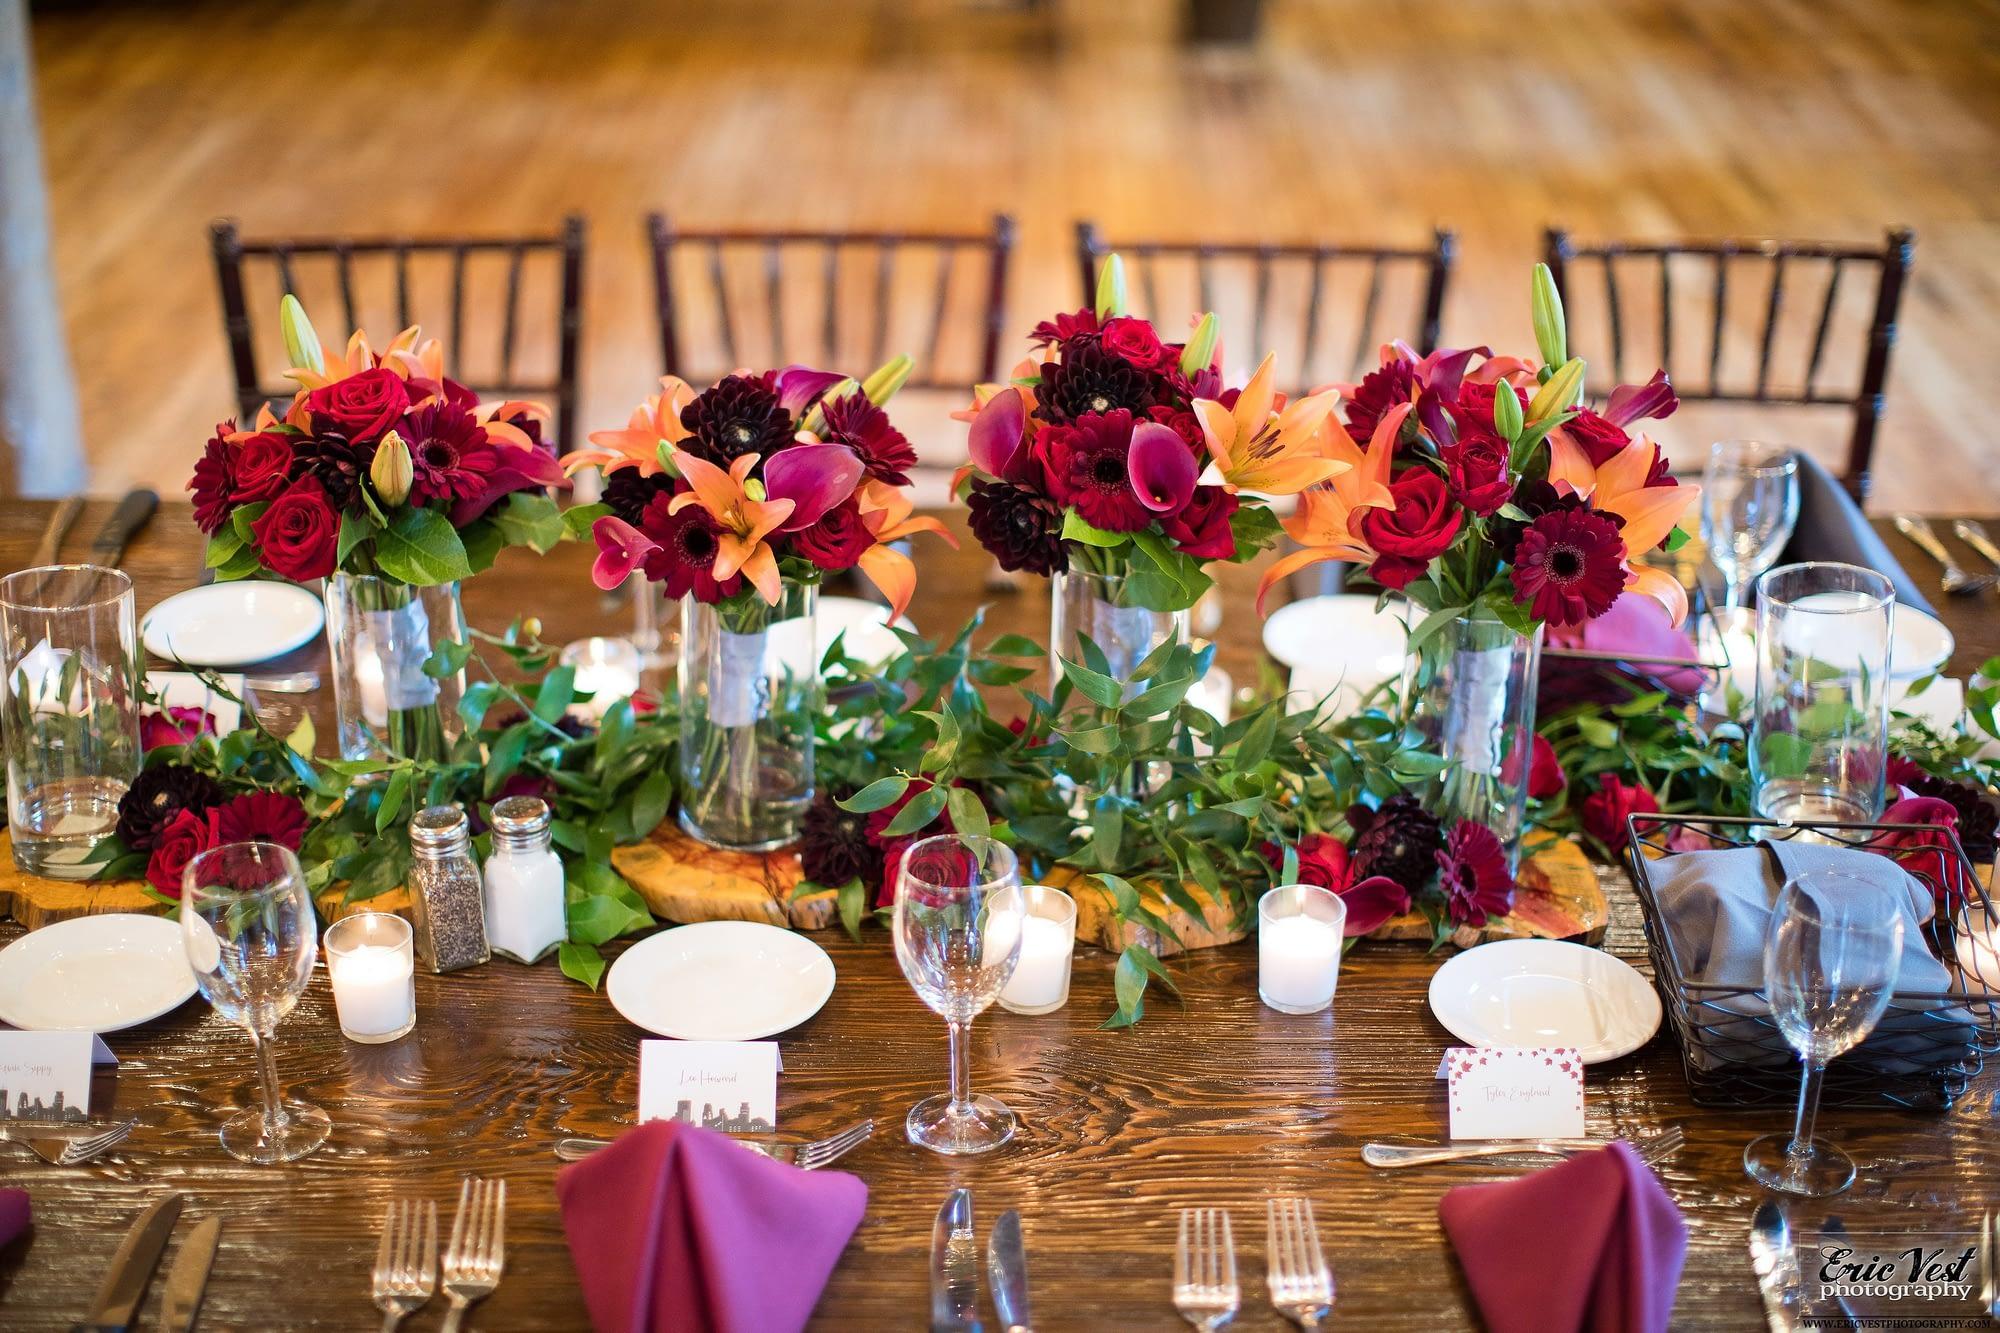 minneapolis event center autumn wedding table decor inspiration